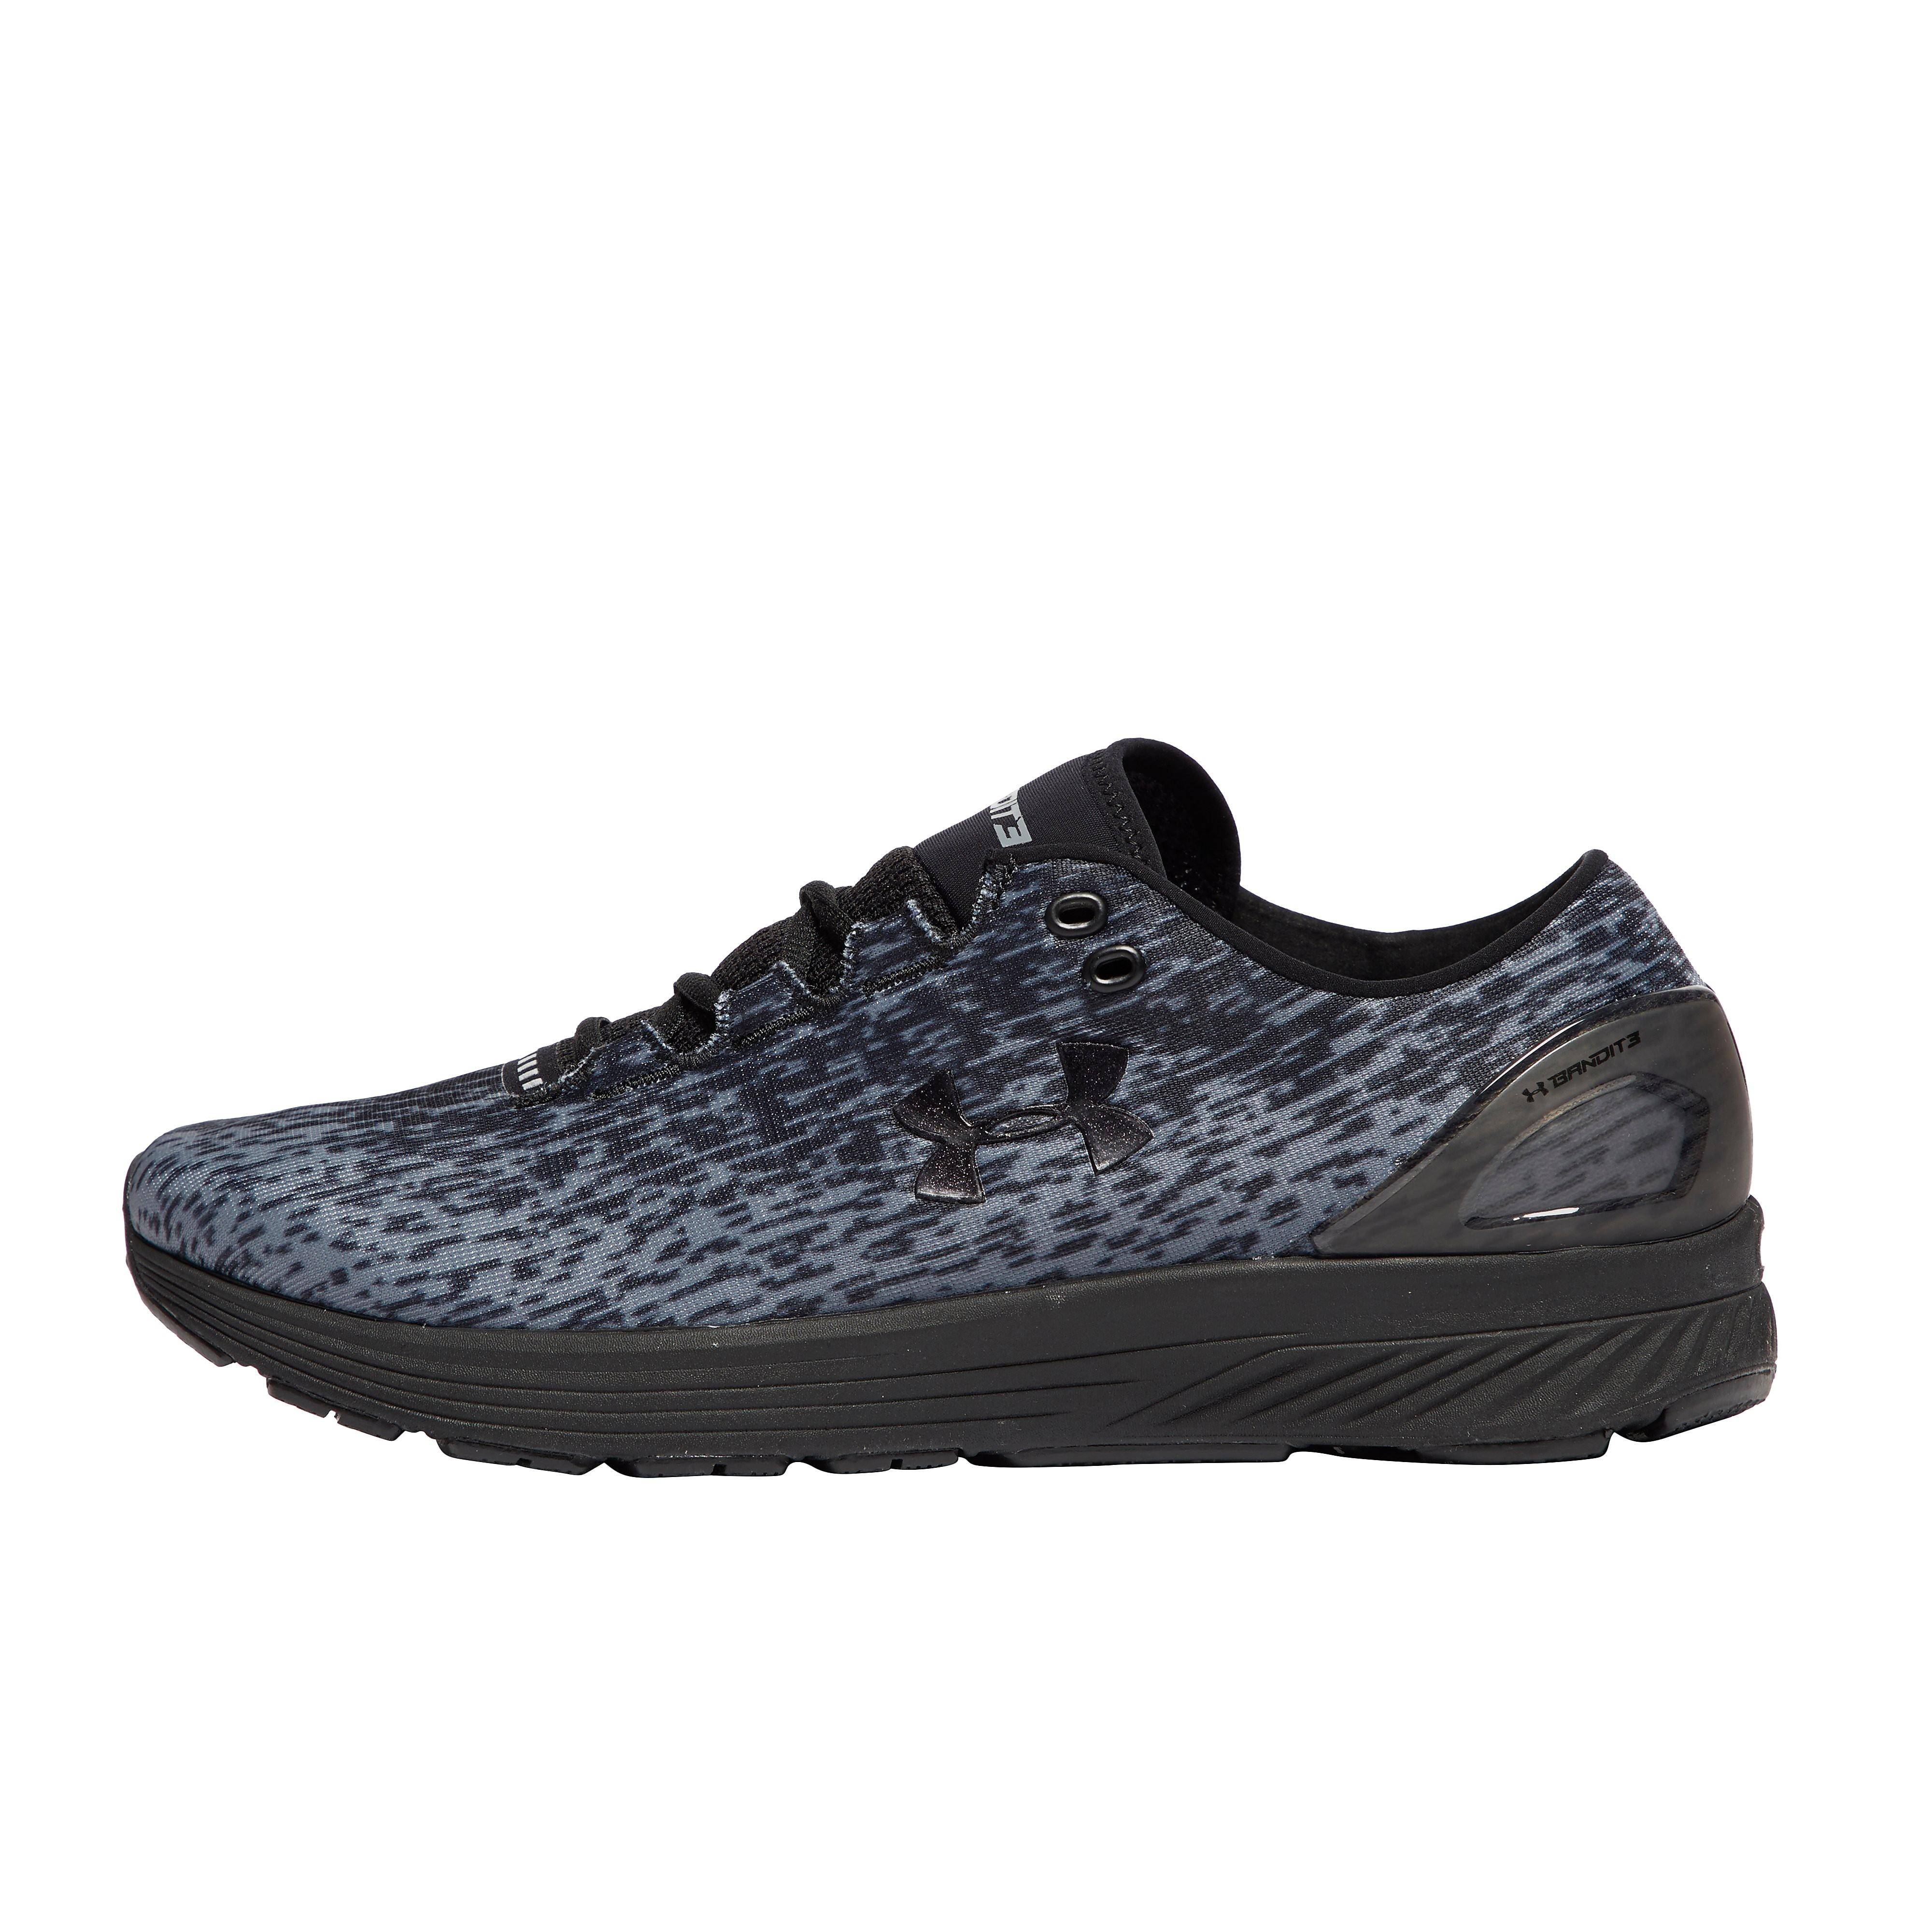 Men's Under Armour Bandit Running Shoes - Grey/Black, Grey/Black